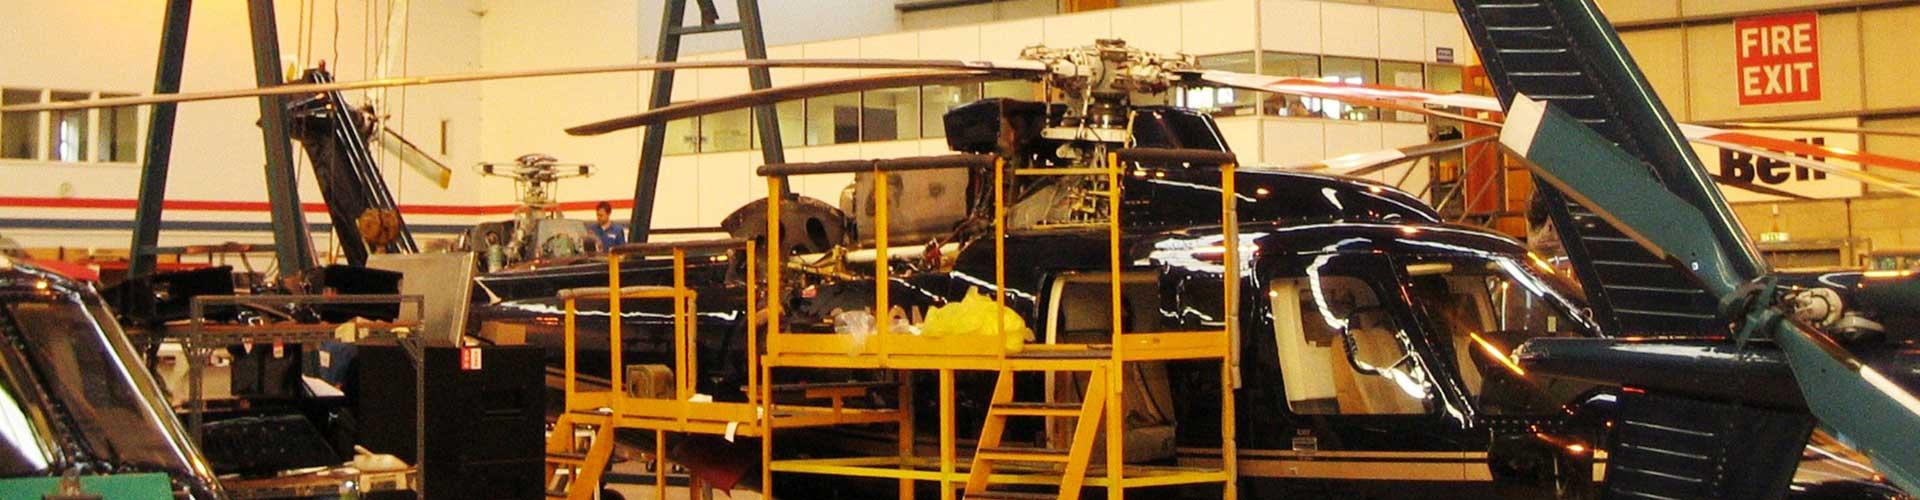 Destratification Fan System PremiAir Blackbusche